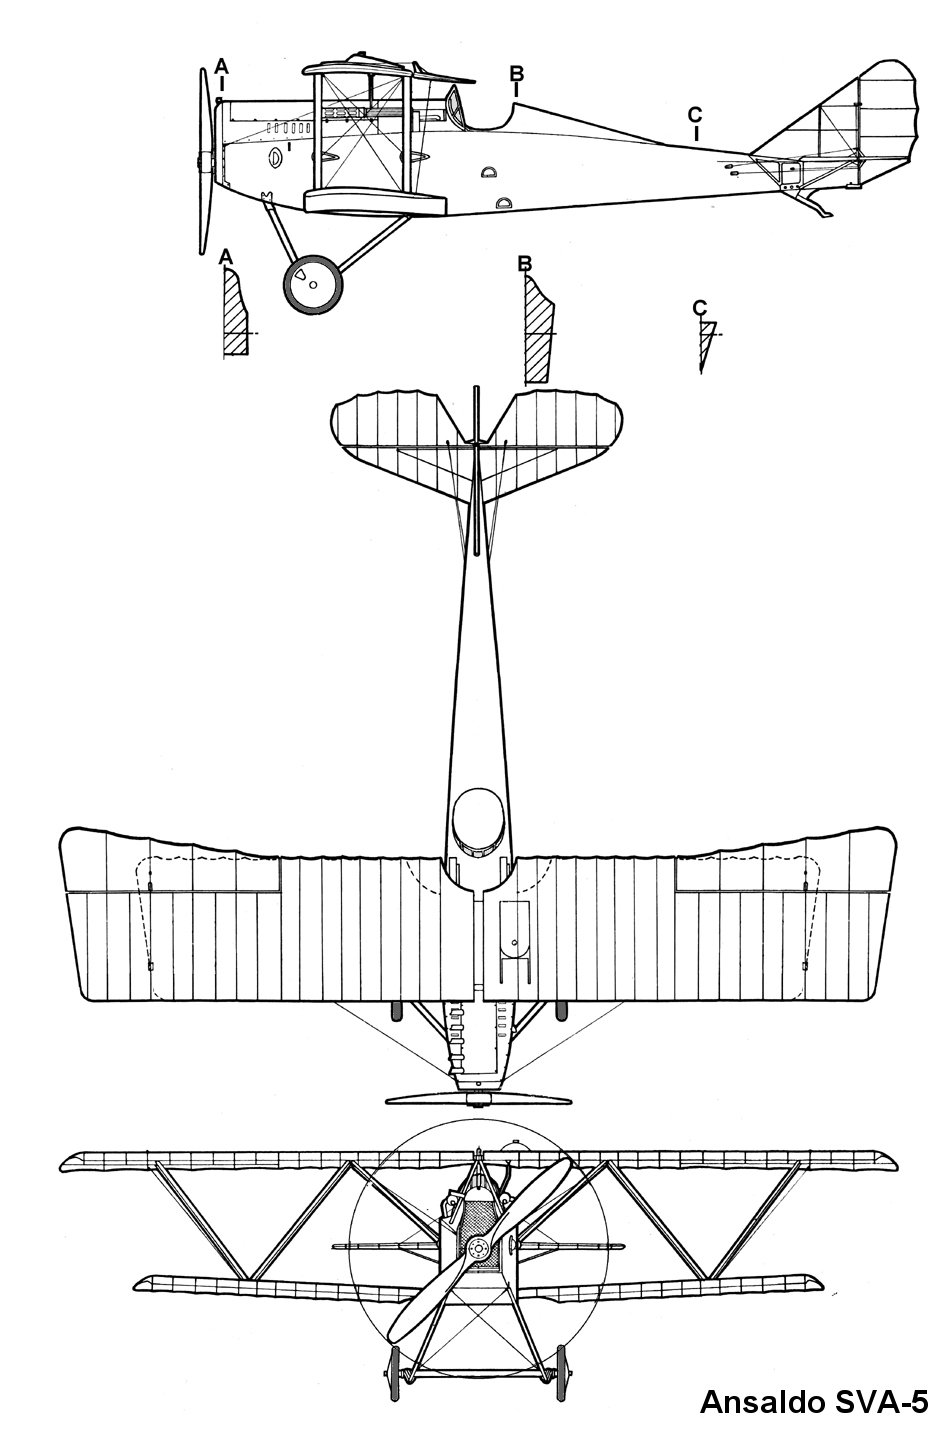 Ansaldo SVA.5 blueprint